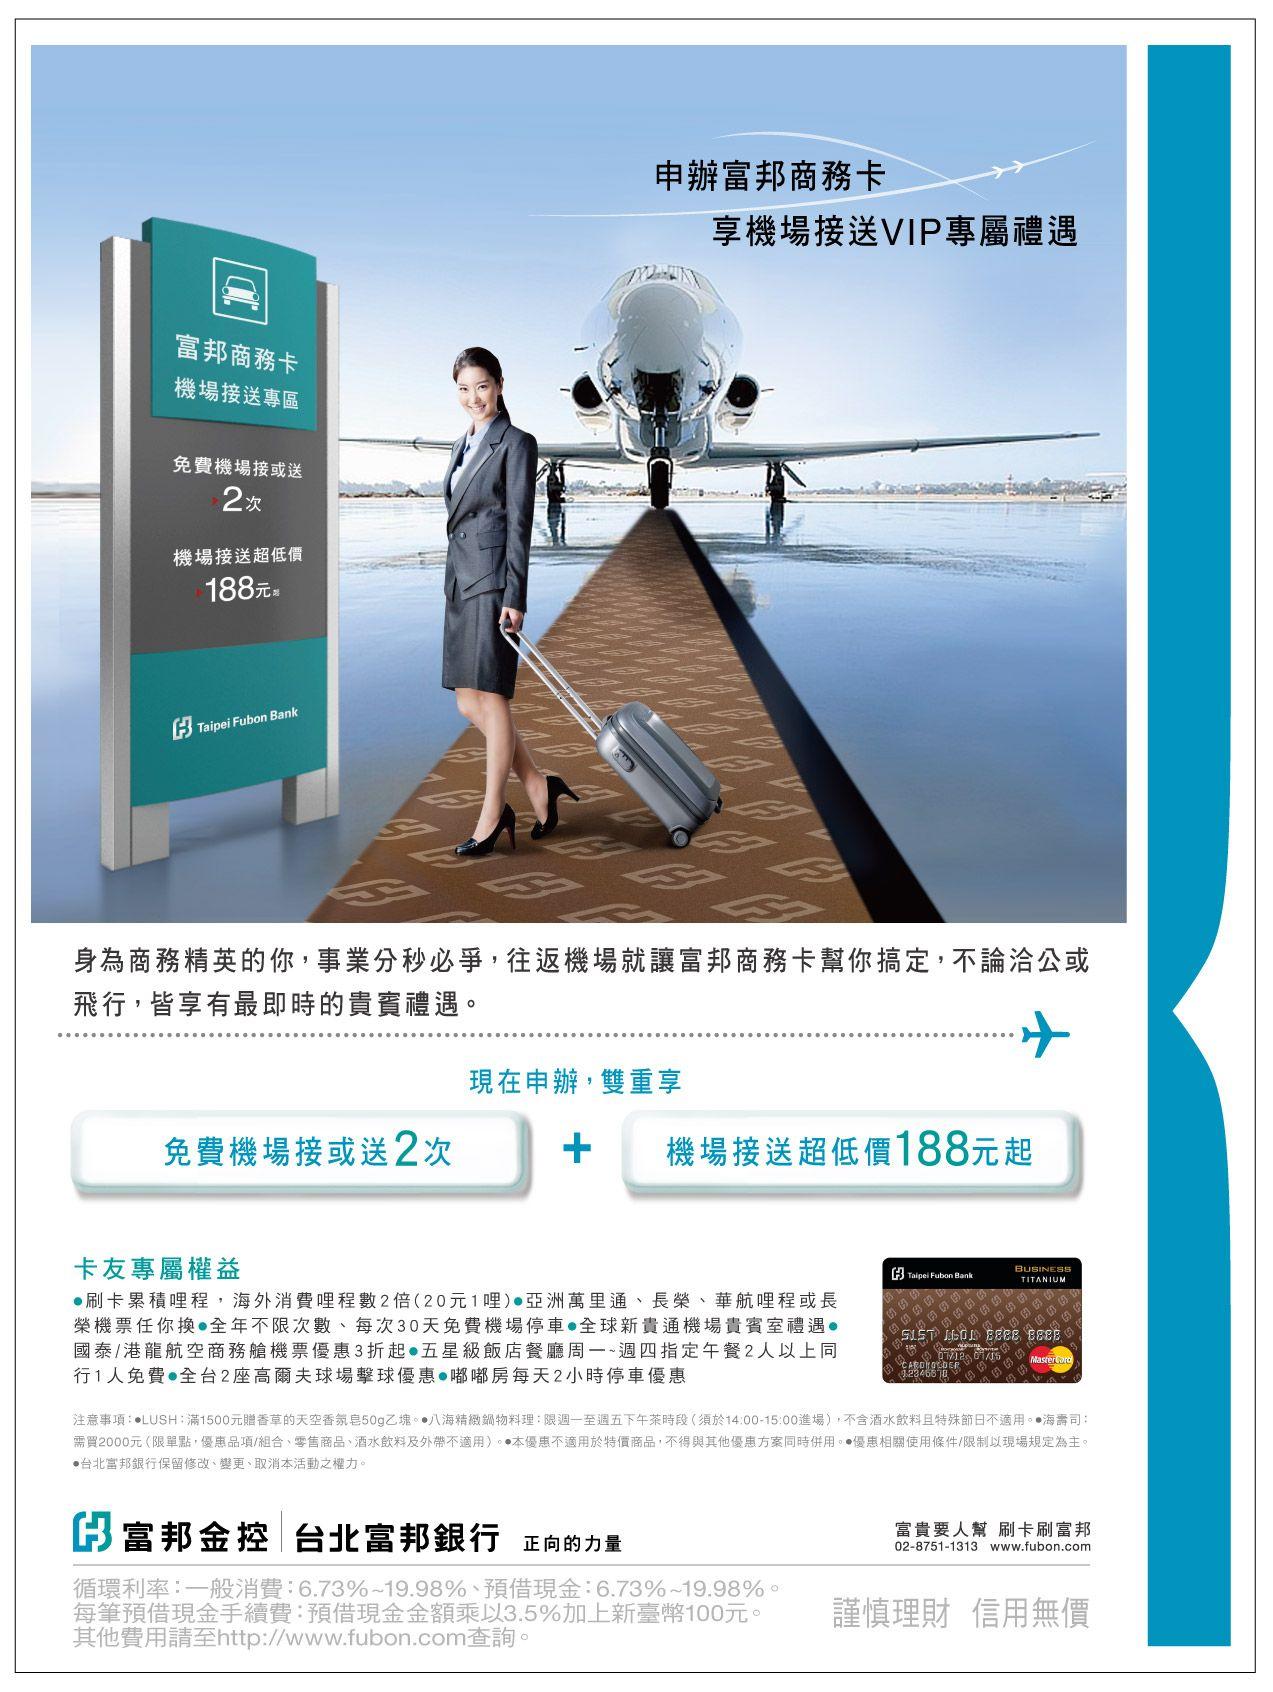 Taipei Fubon Bank 台北富邦銀行 - Titanium Business Credit Card (富邦鈦